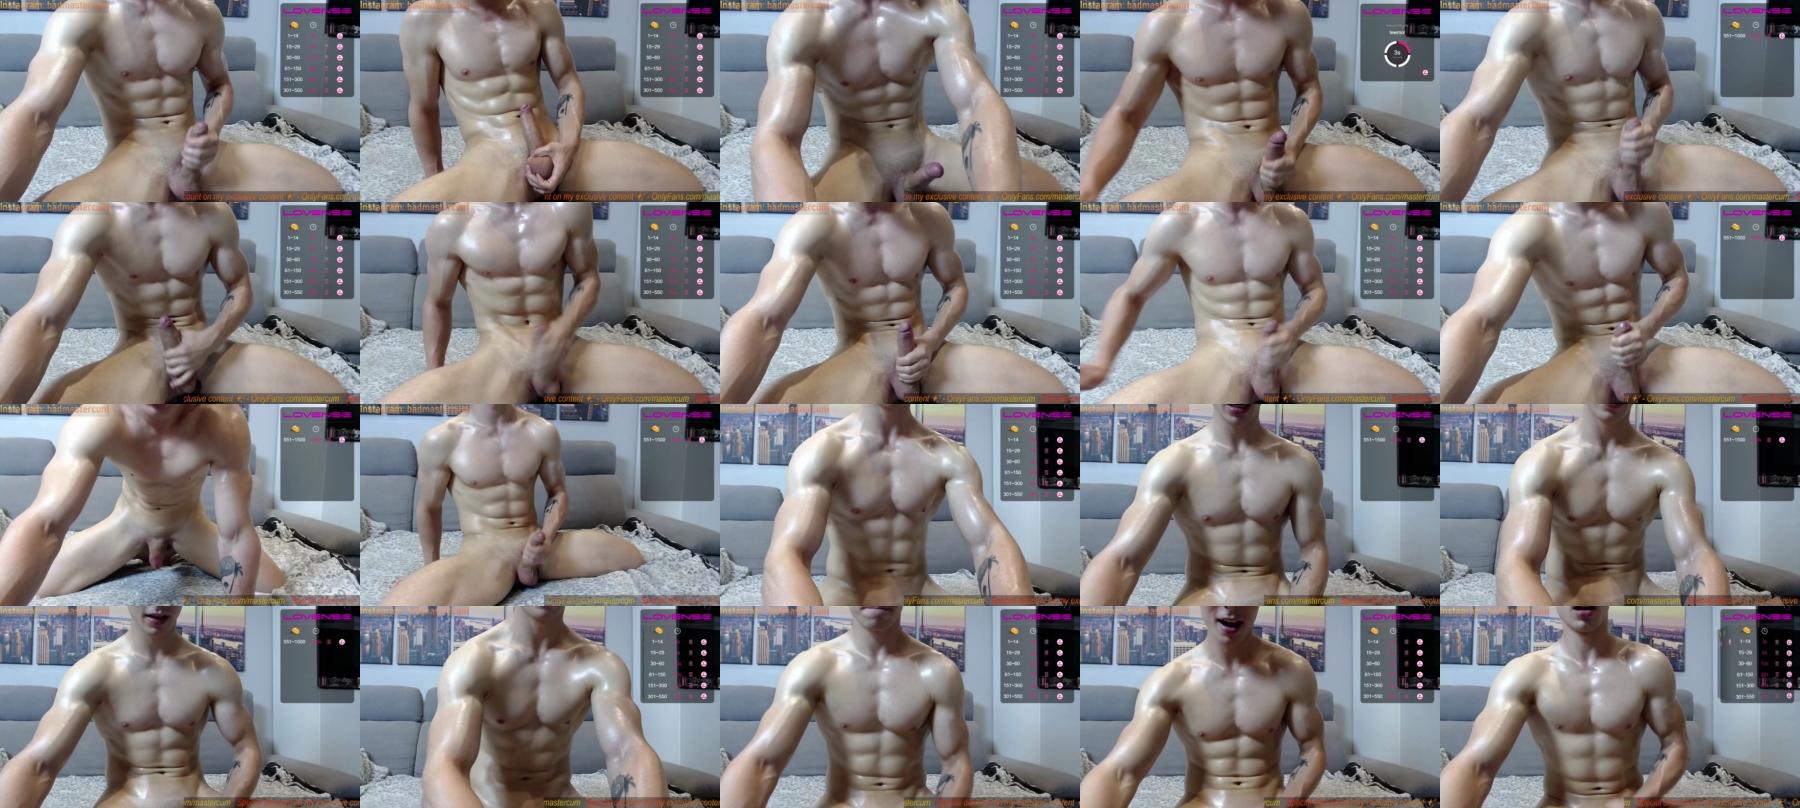 Destroy_Boy Webcam CAM SHOW @ Chaturbate 18-07-2021